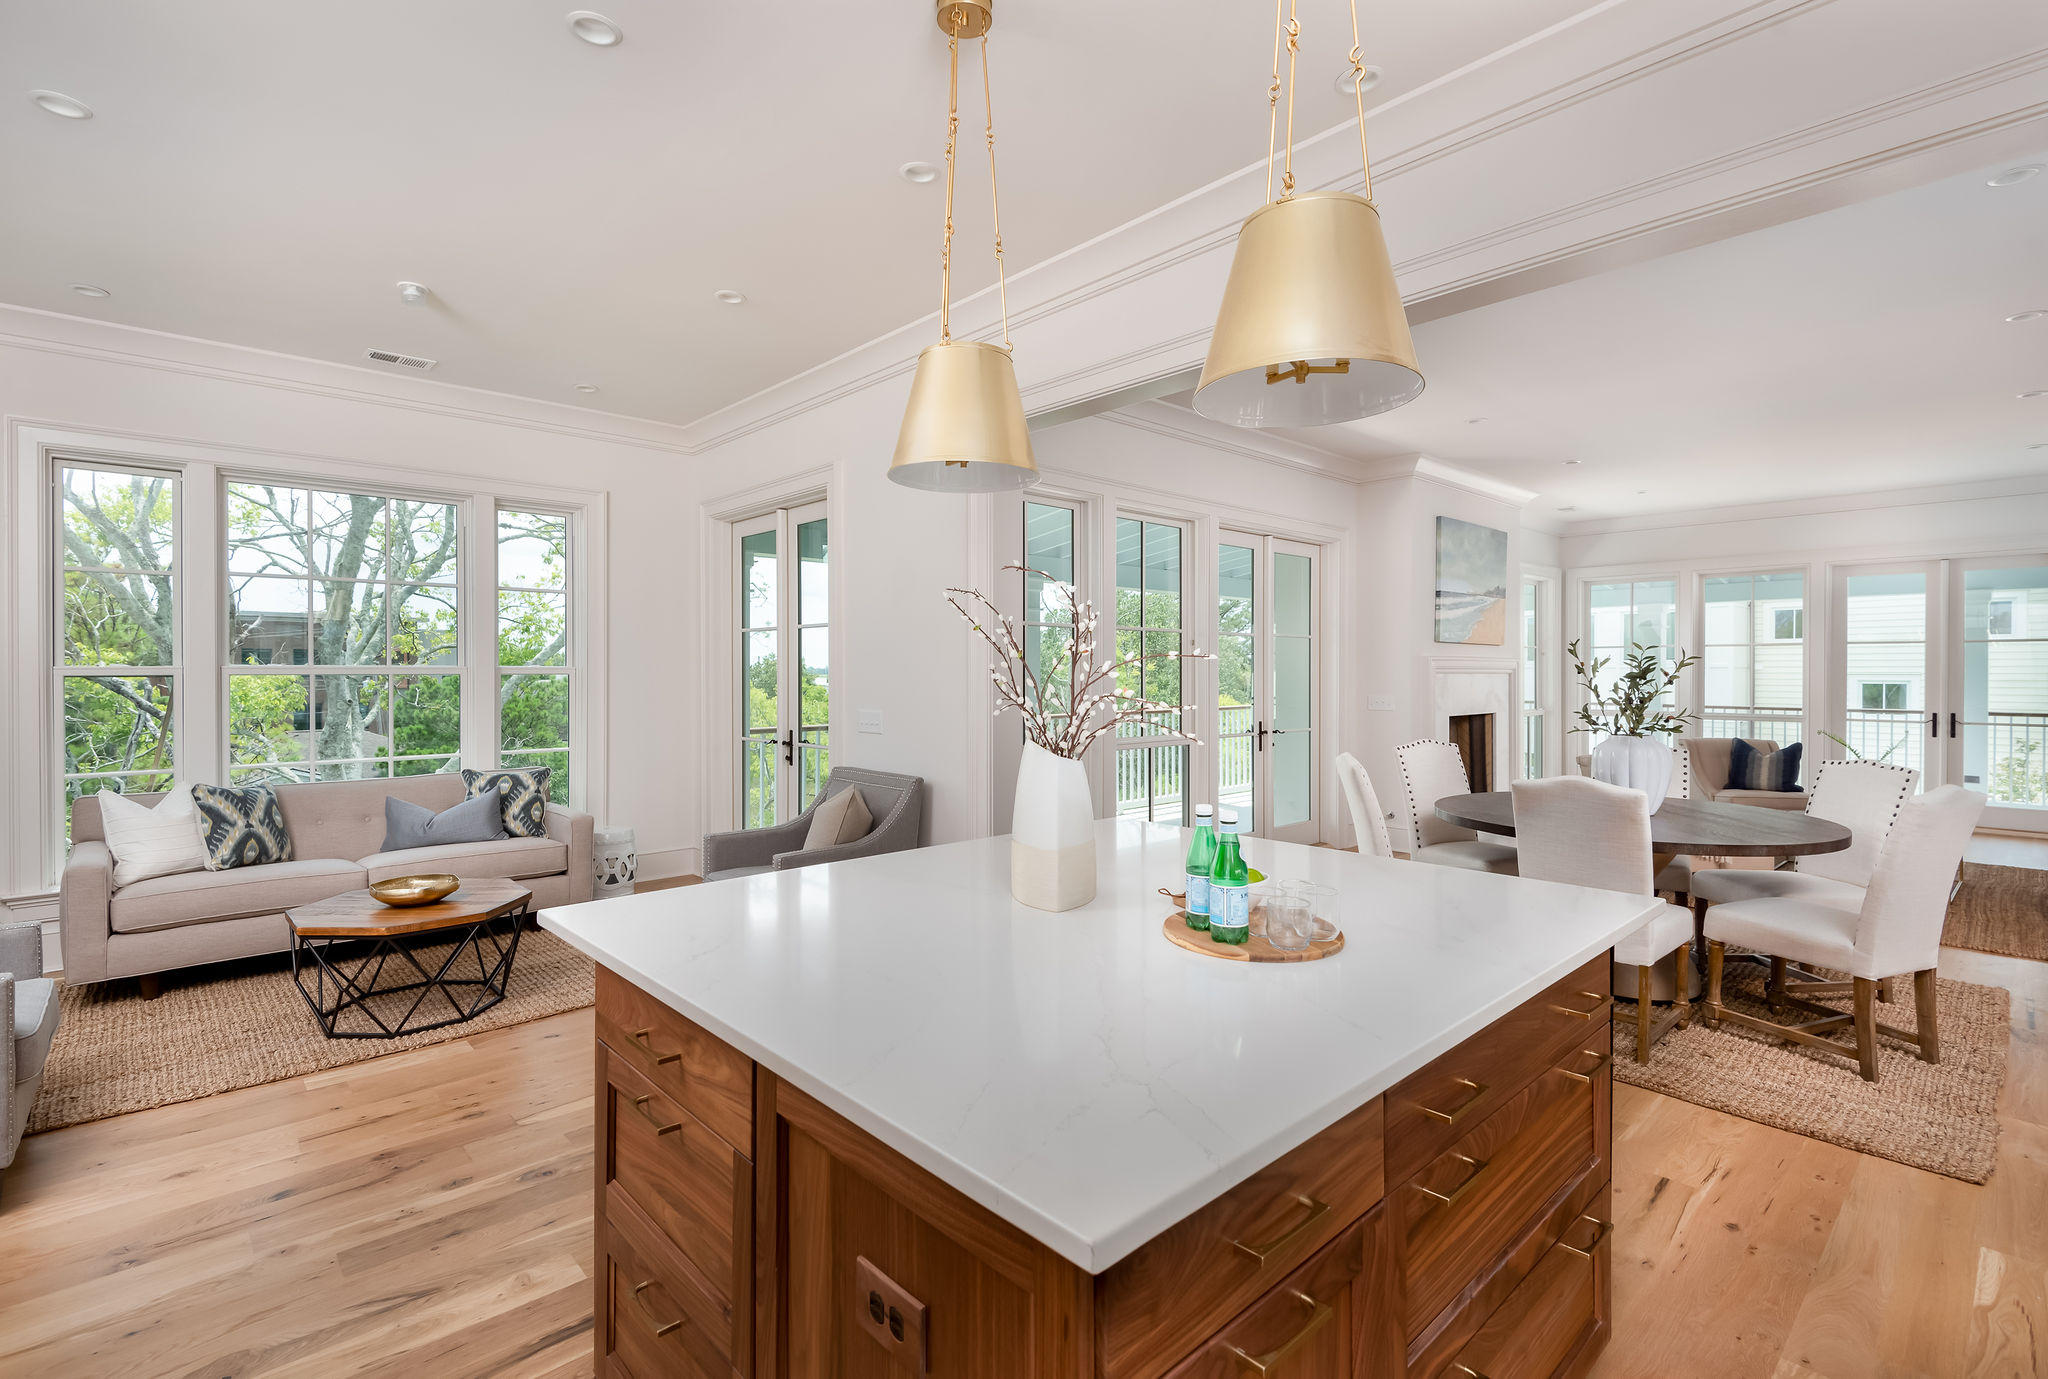 Harleston Village Homes For Sale - 55 Barre, Charleston, SC - 29